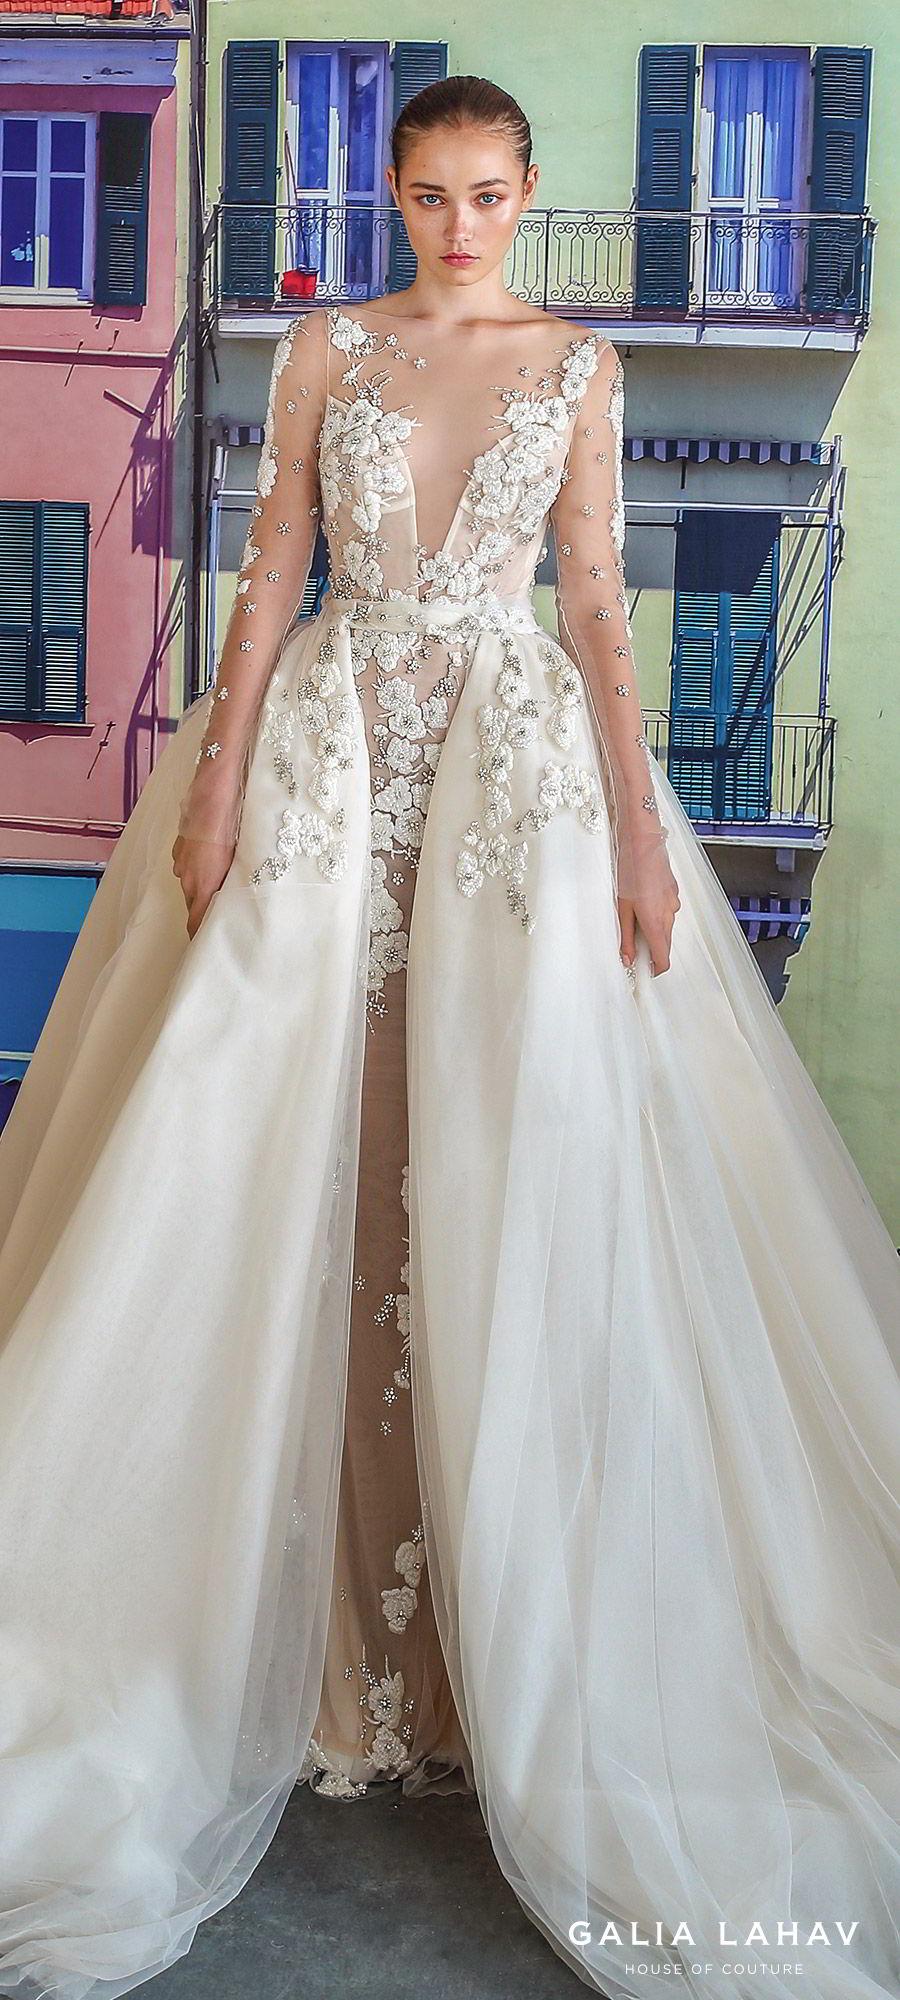 galia lahav fall 2019 bridal illusion long sleeves sheer bateau plunging sweetheart neckline sheath mermaid wedding dress ball gown overskirt low back romantic princess (nevis) zv